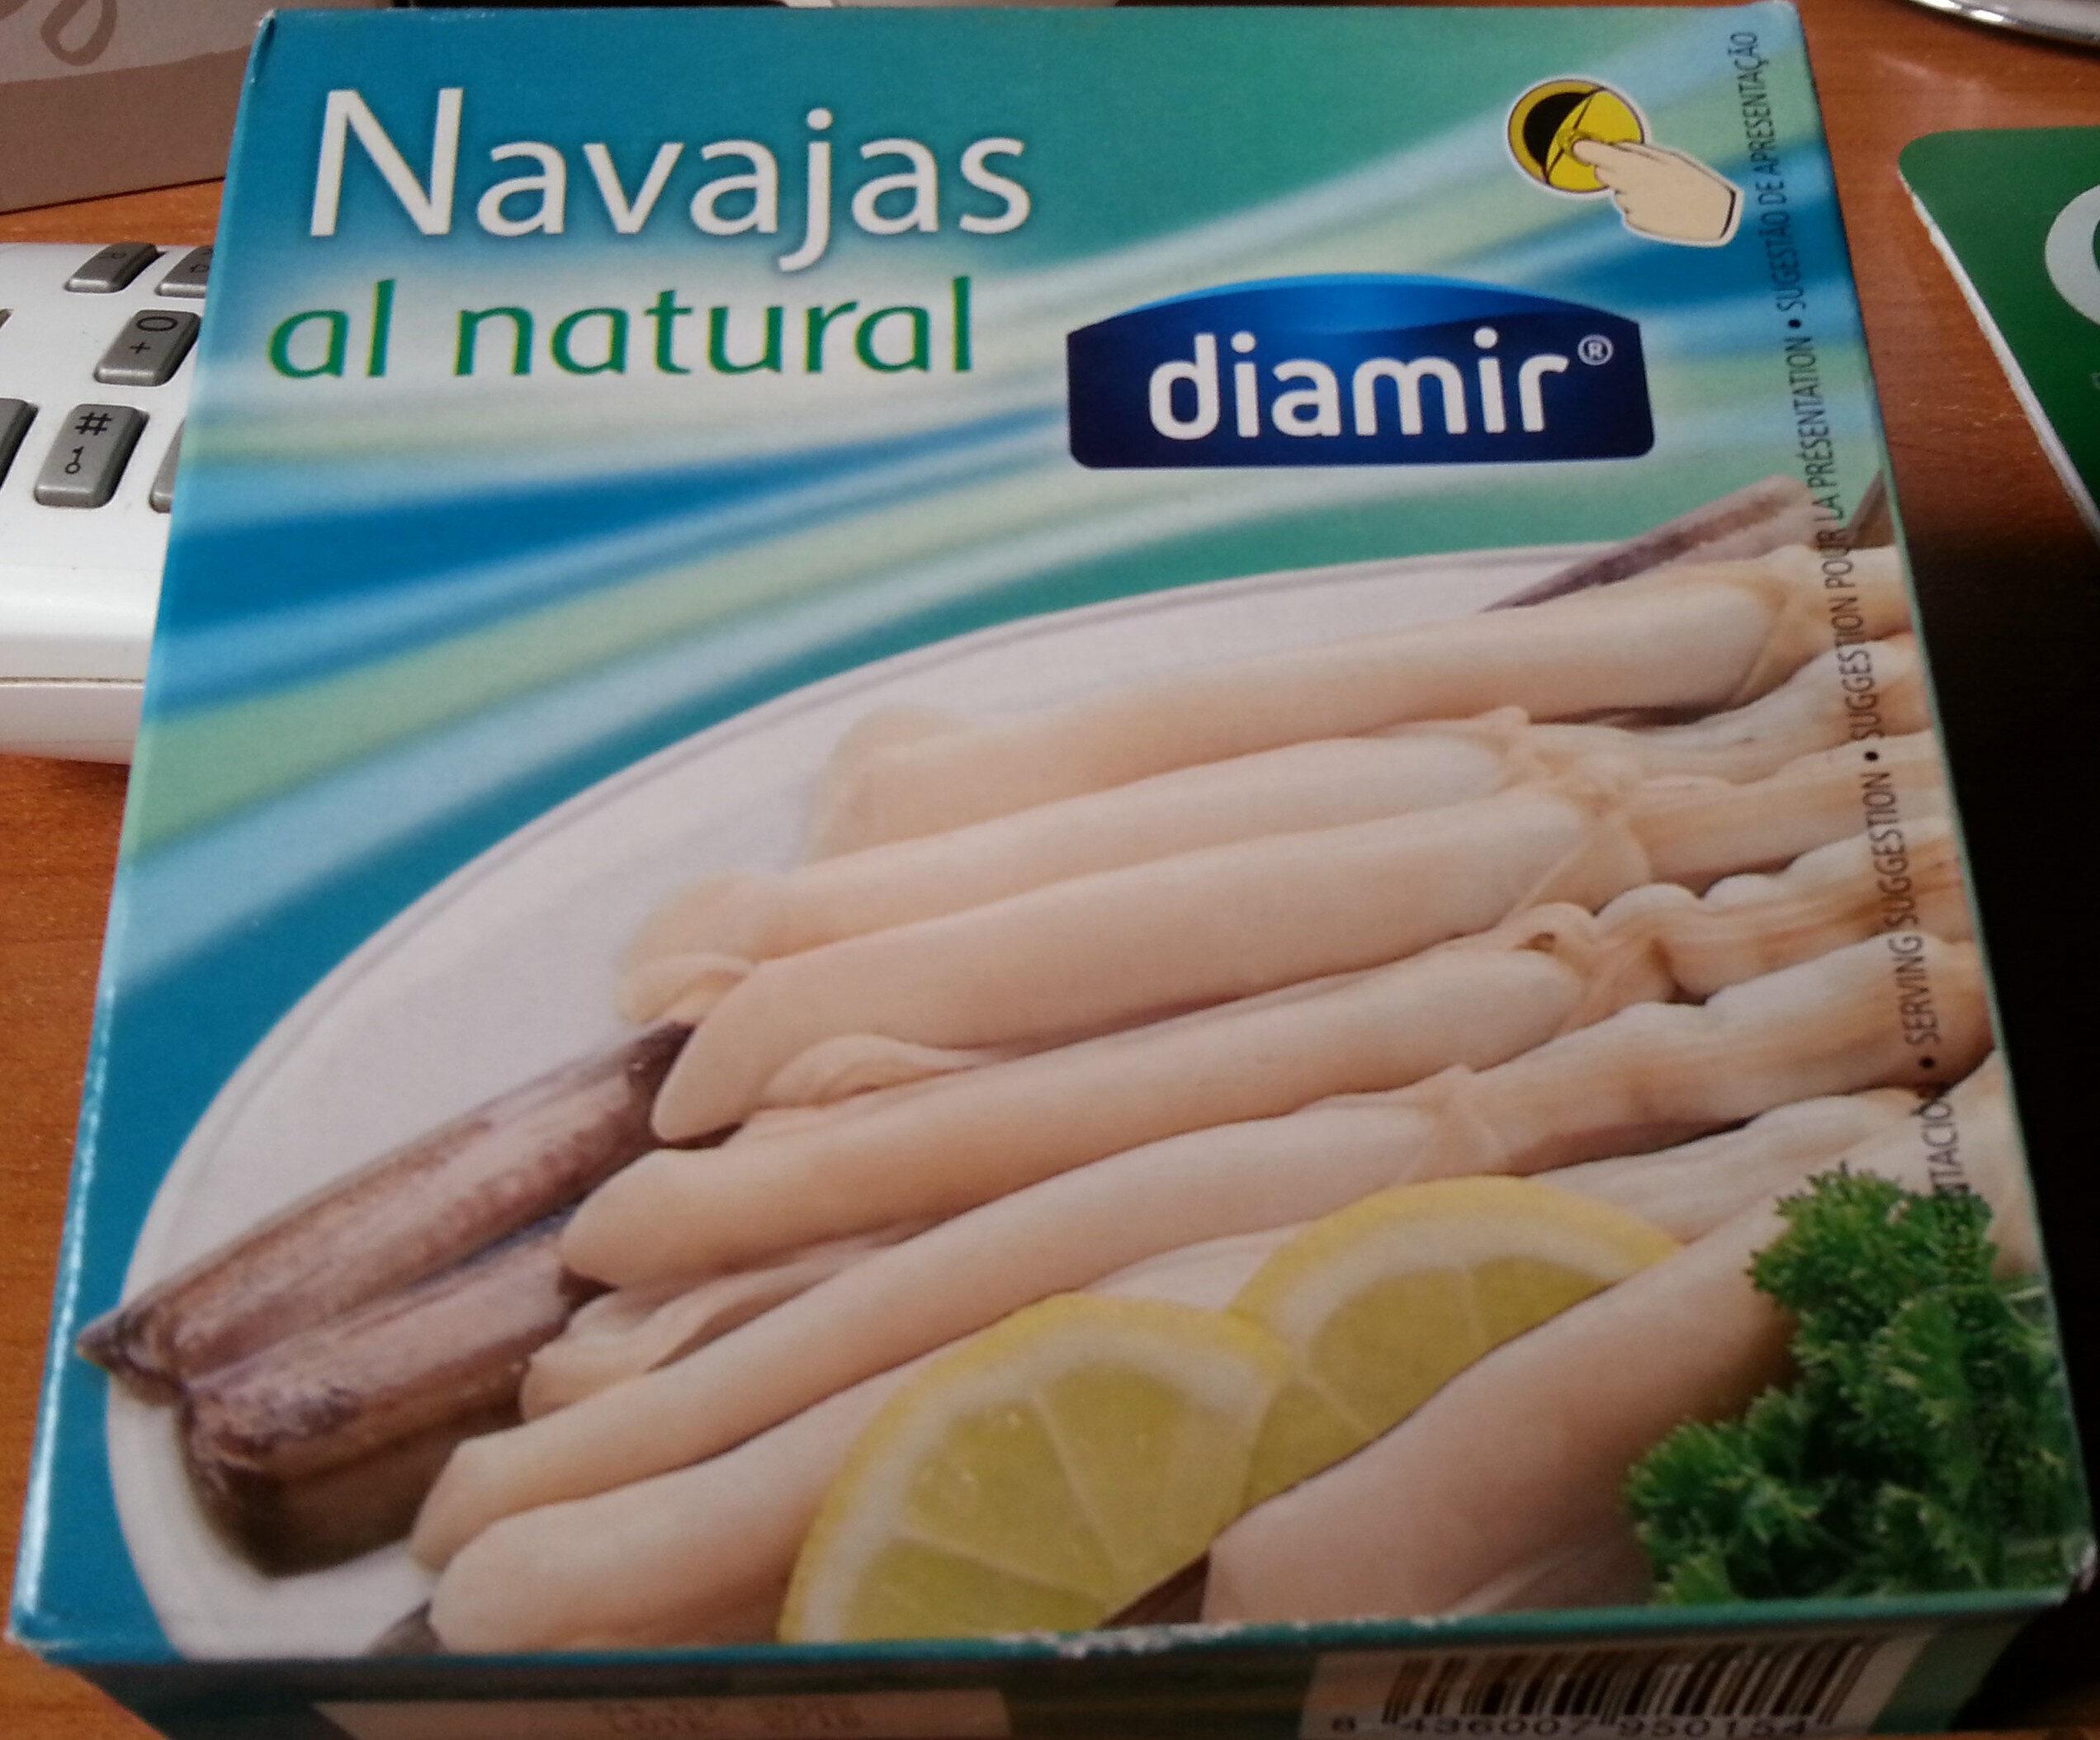 Navajas al natural - Product